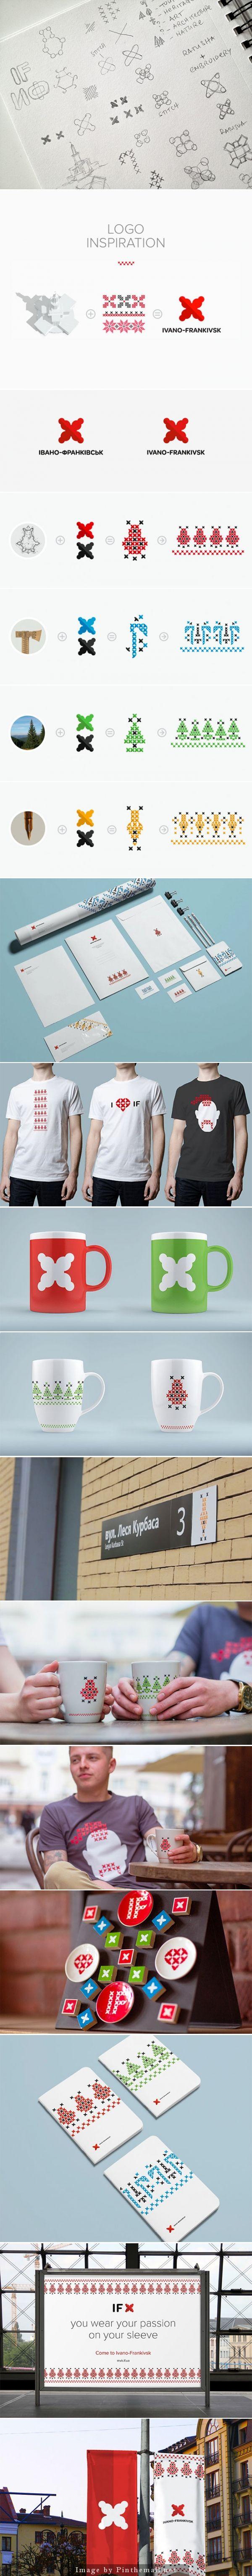 #branding #identity #logo